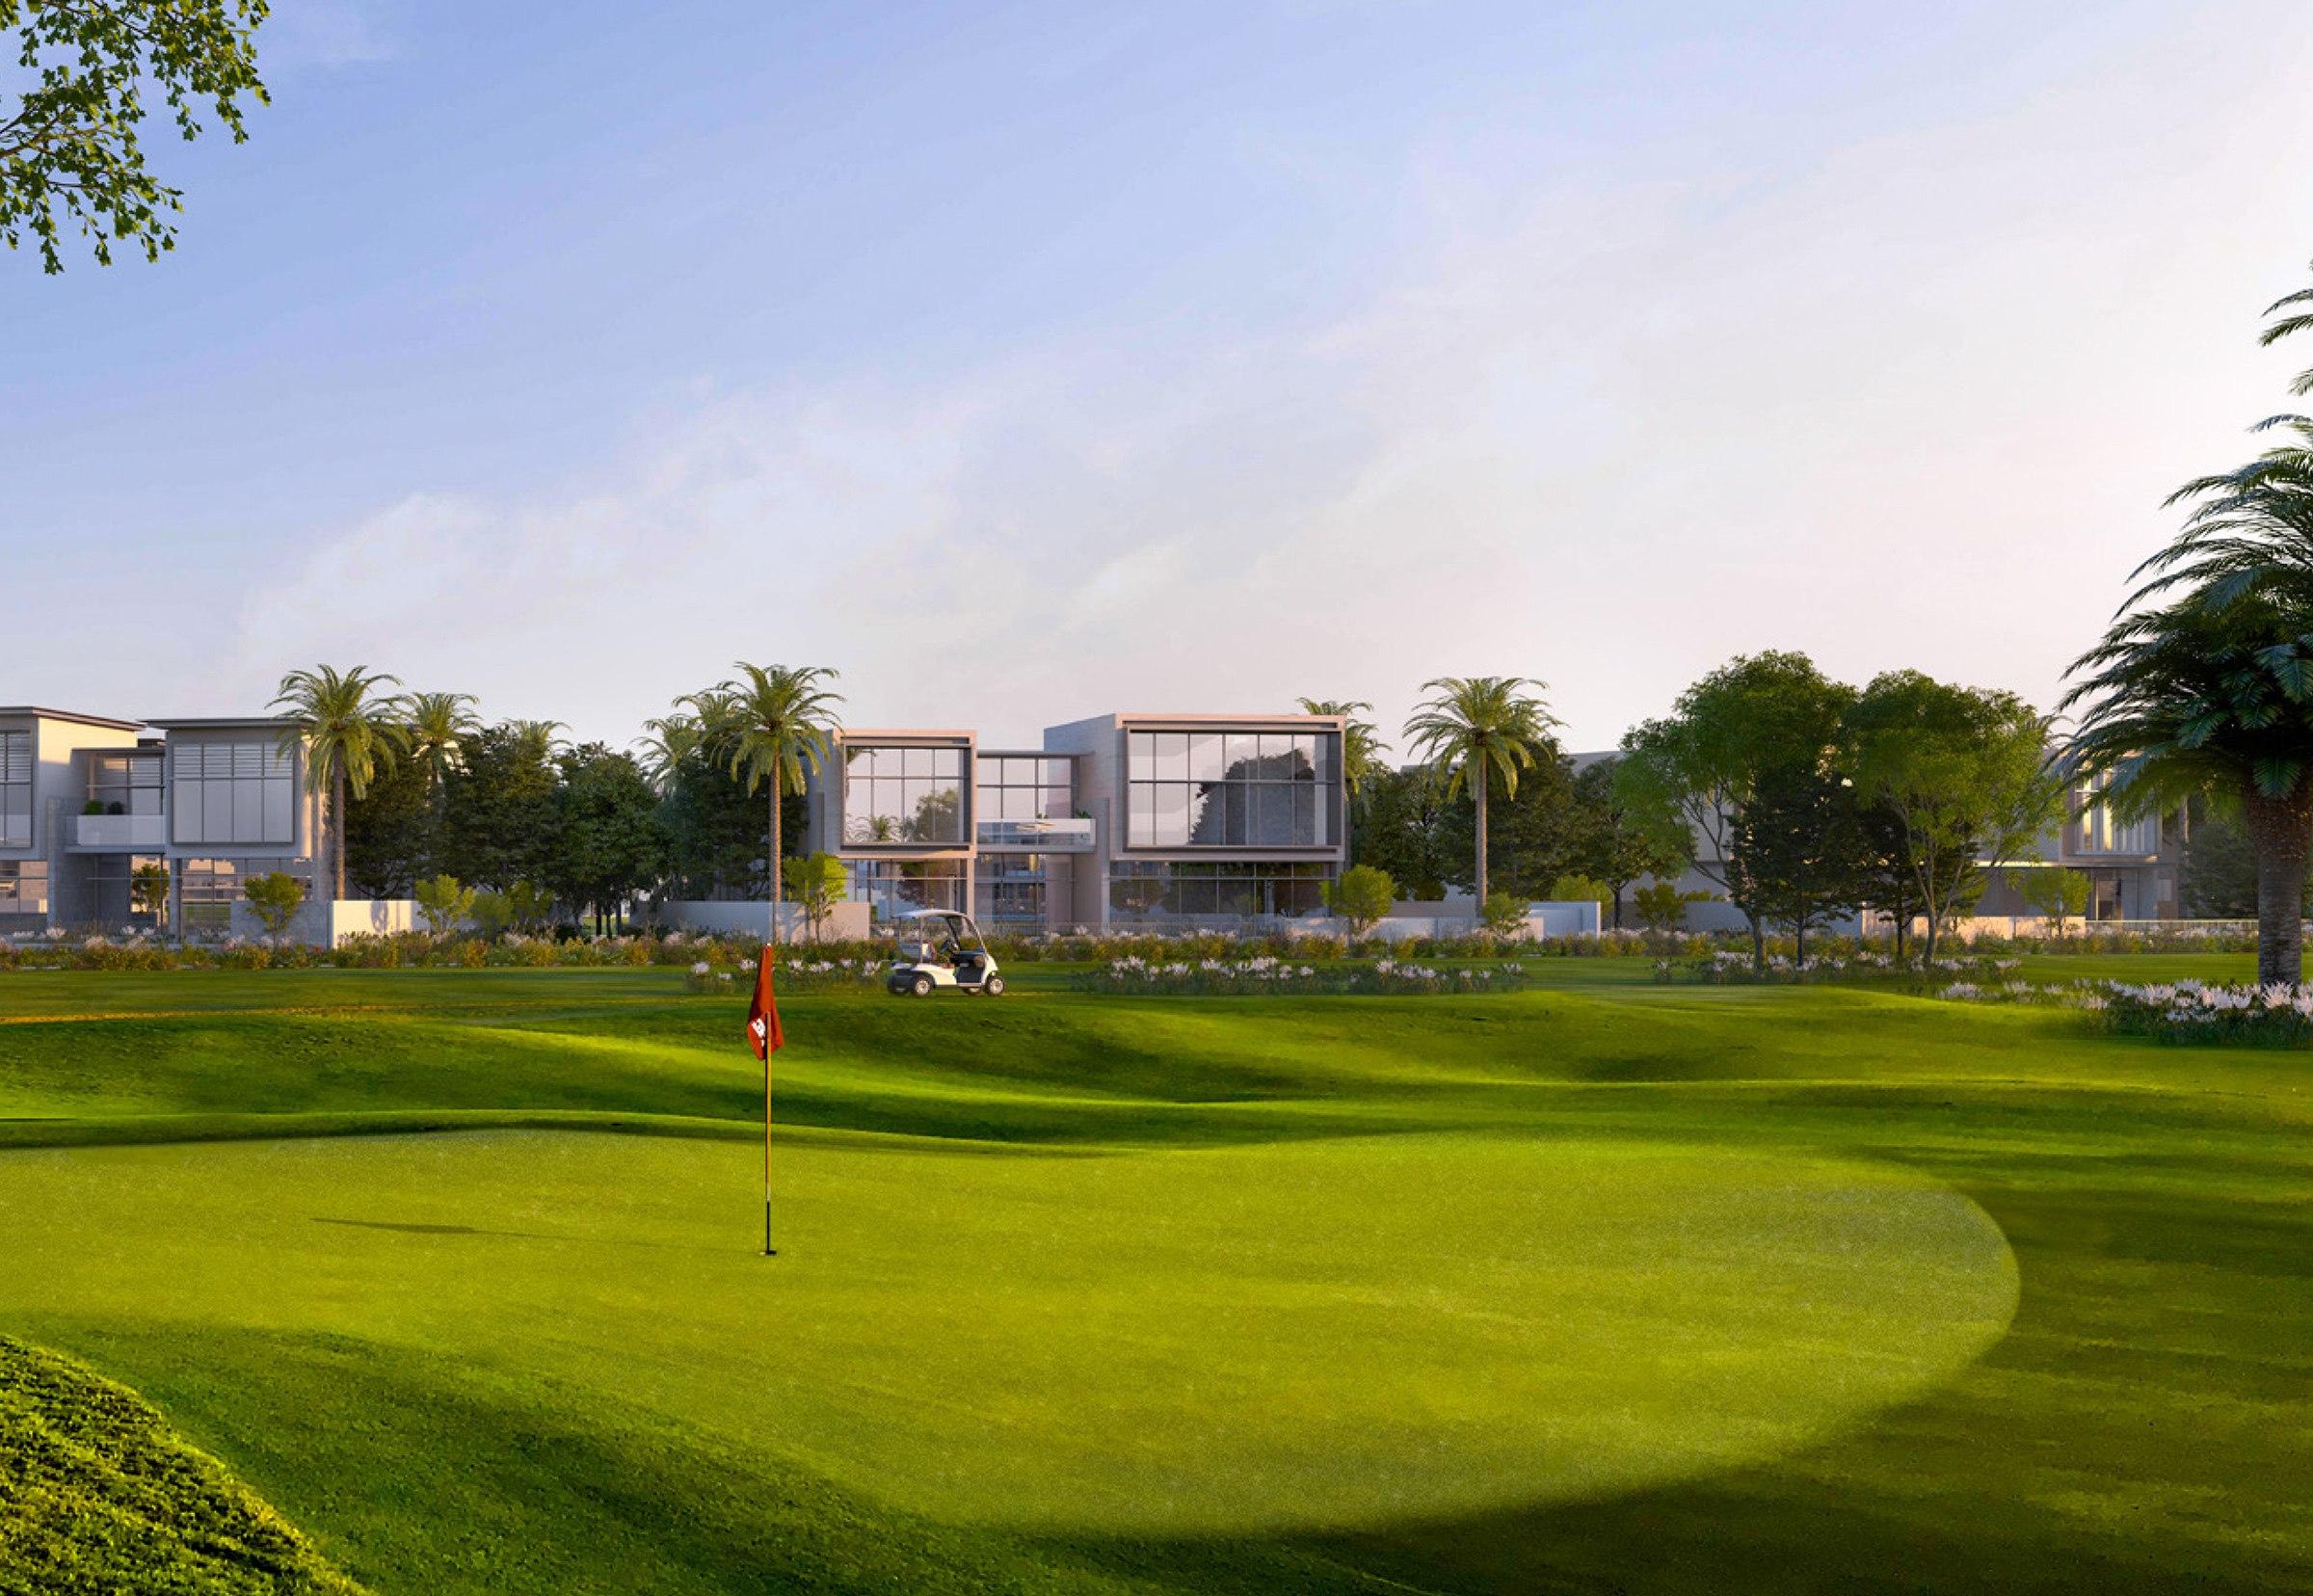 Golf place by Emaar at Dubai Hills Estate